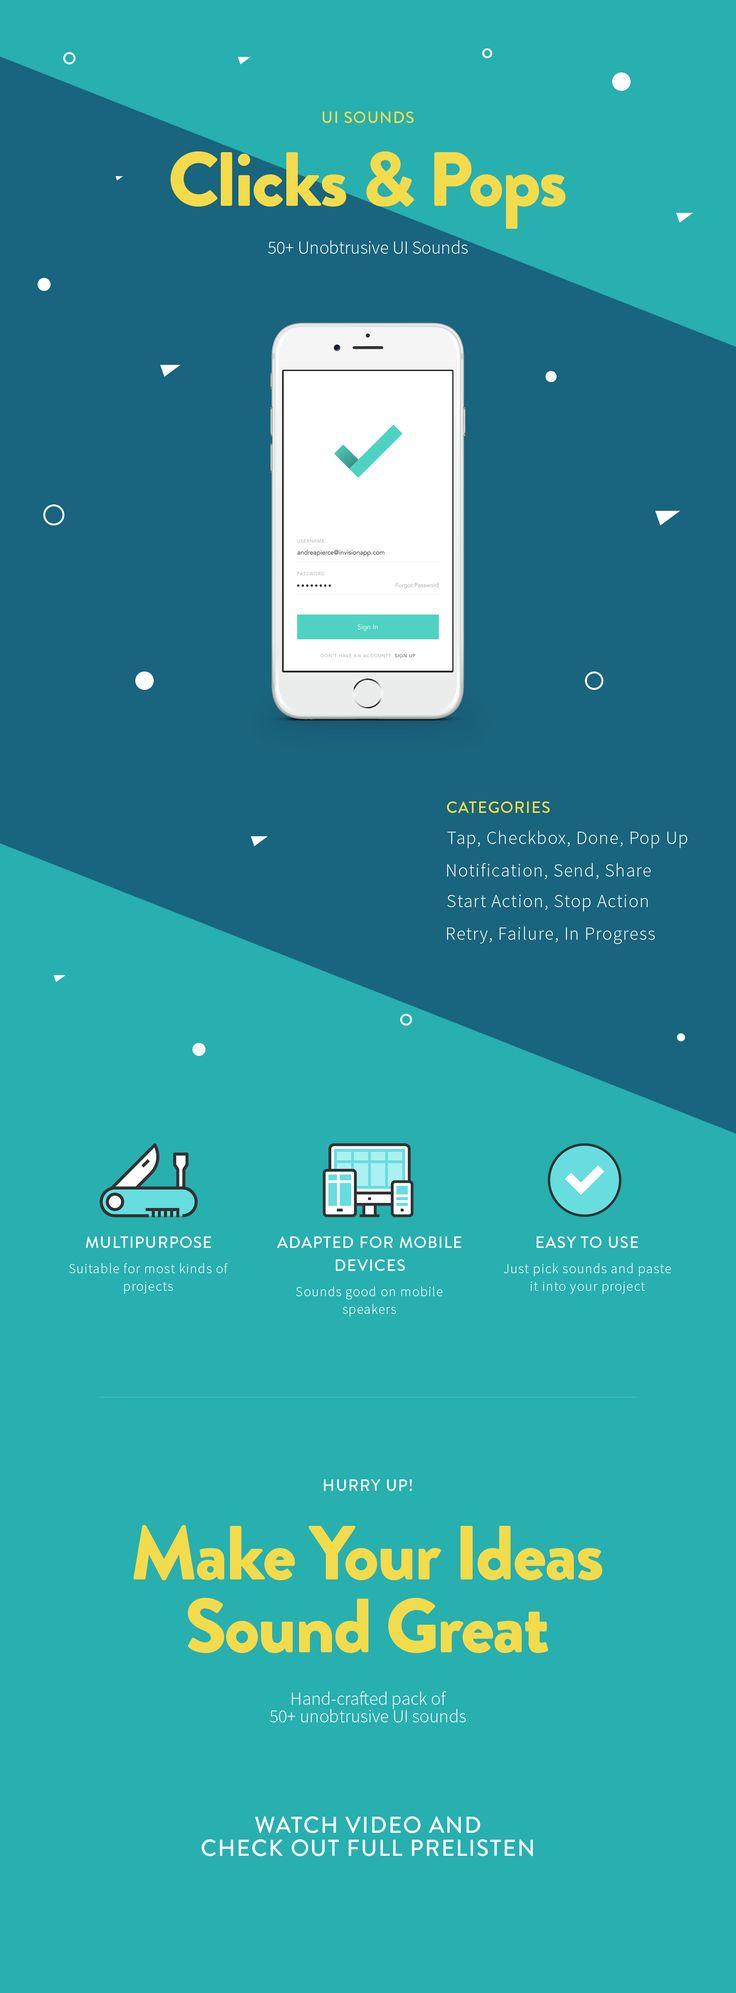 Clicks & Pops UI Sounds – Ui kit by Appsounds